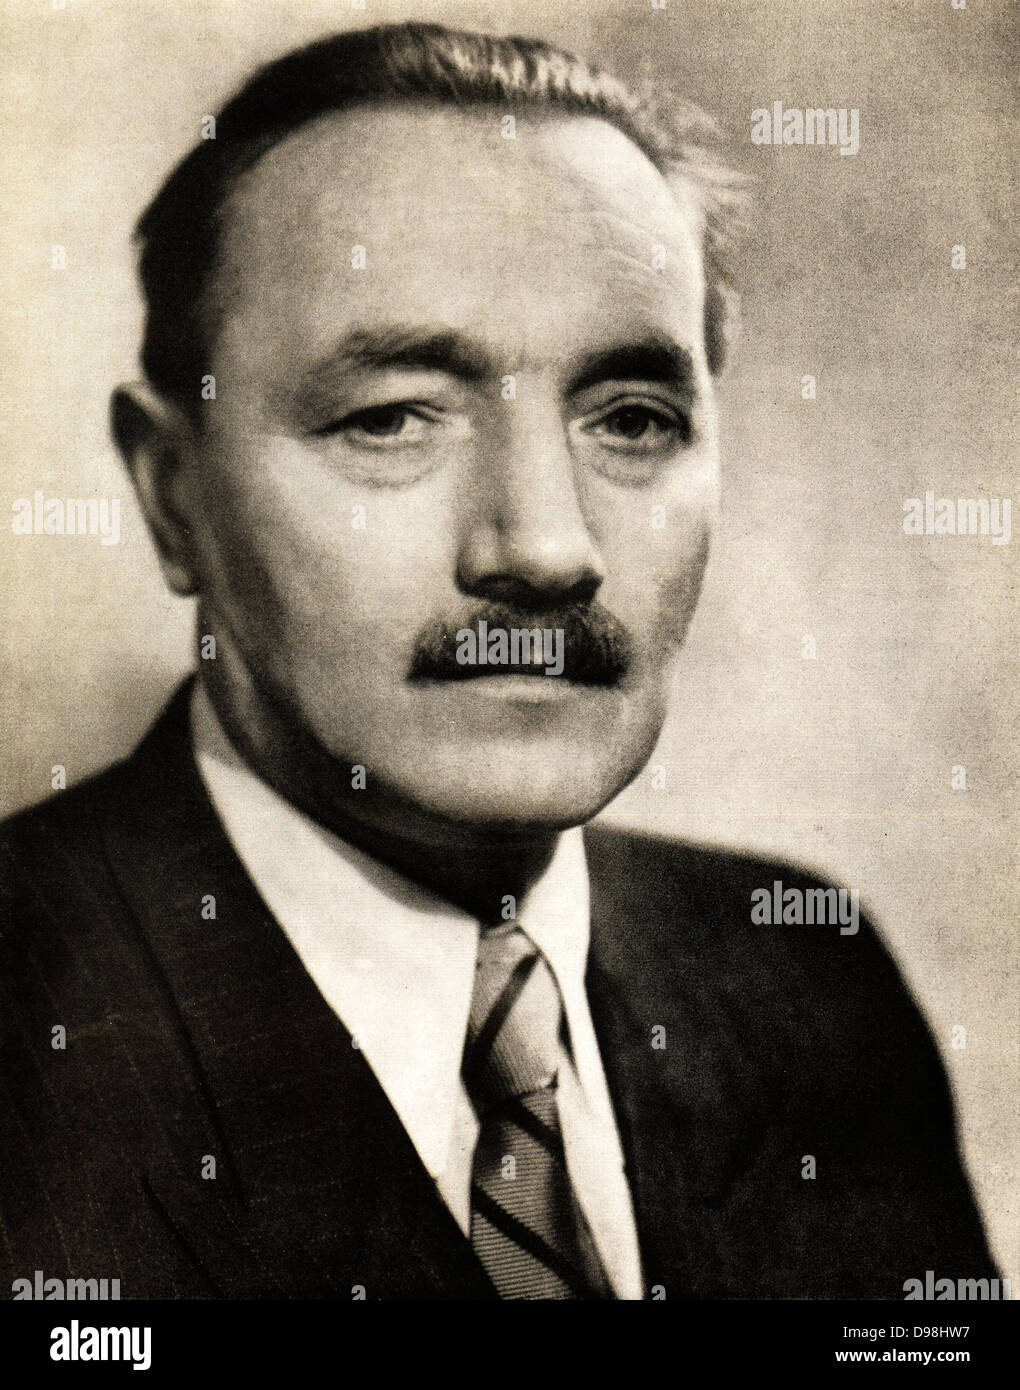 Boles?aw Bierut 1892 - 1956. Polish Communist leader. President of Poland 1947 – 1952 - Stock Image